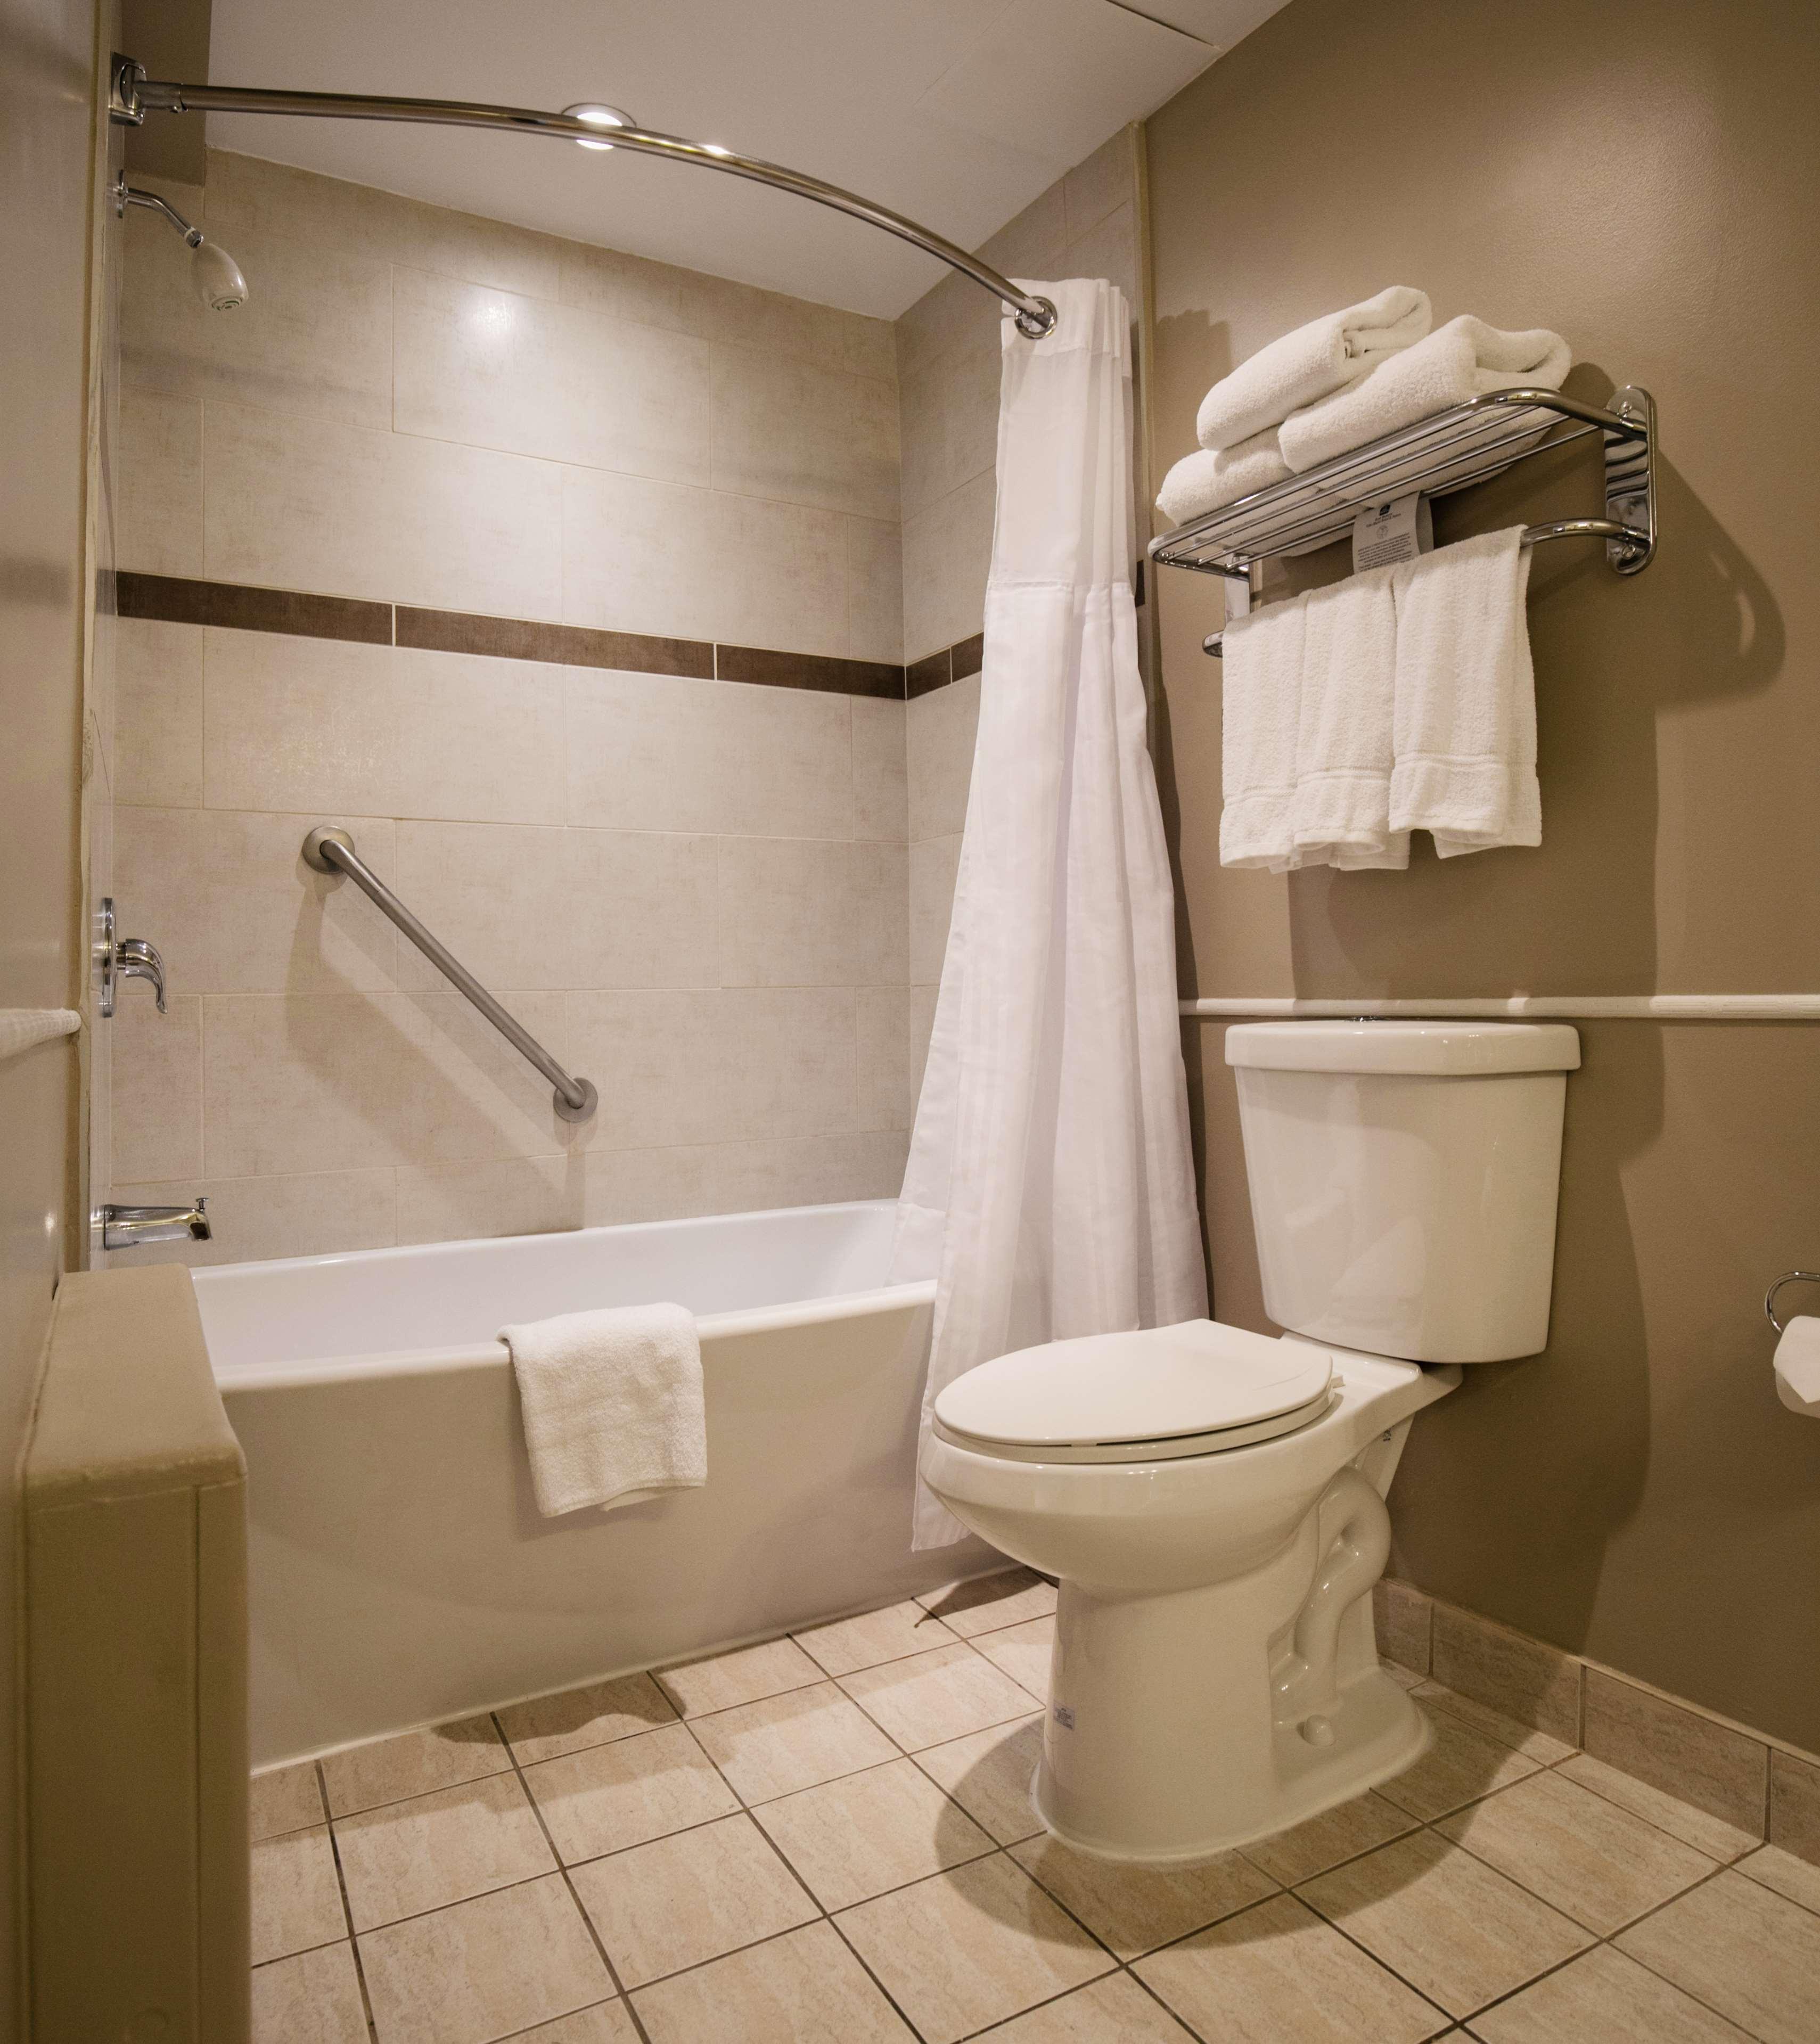 Best Western Ville-Marie Montreal Hotel & Suites à Montreal: Guest Bathroom